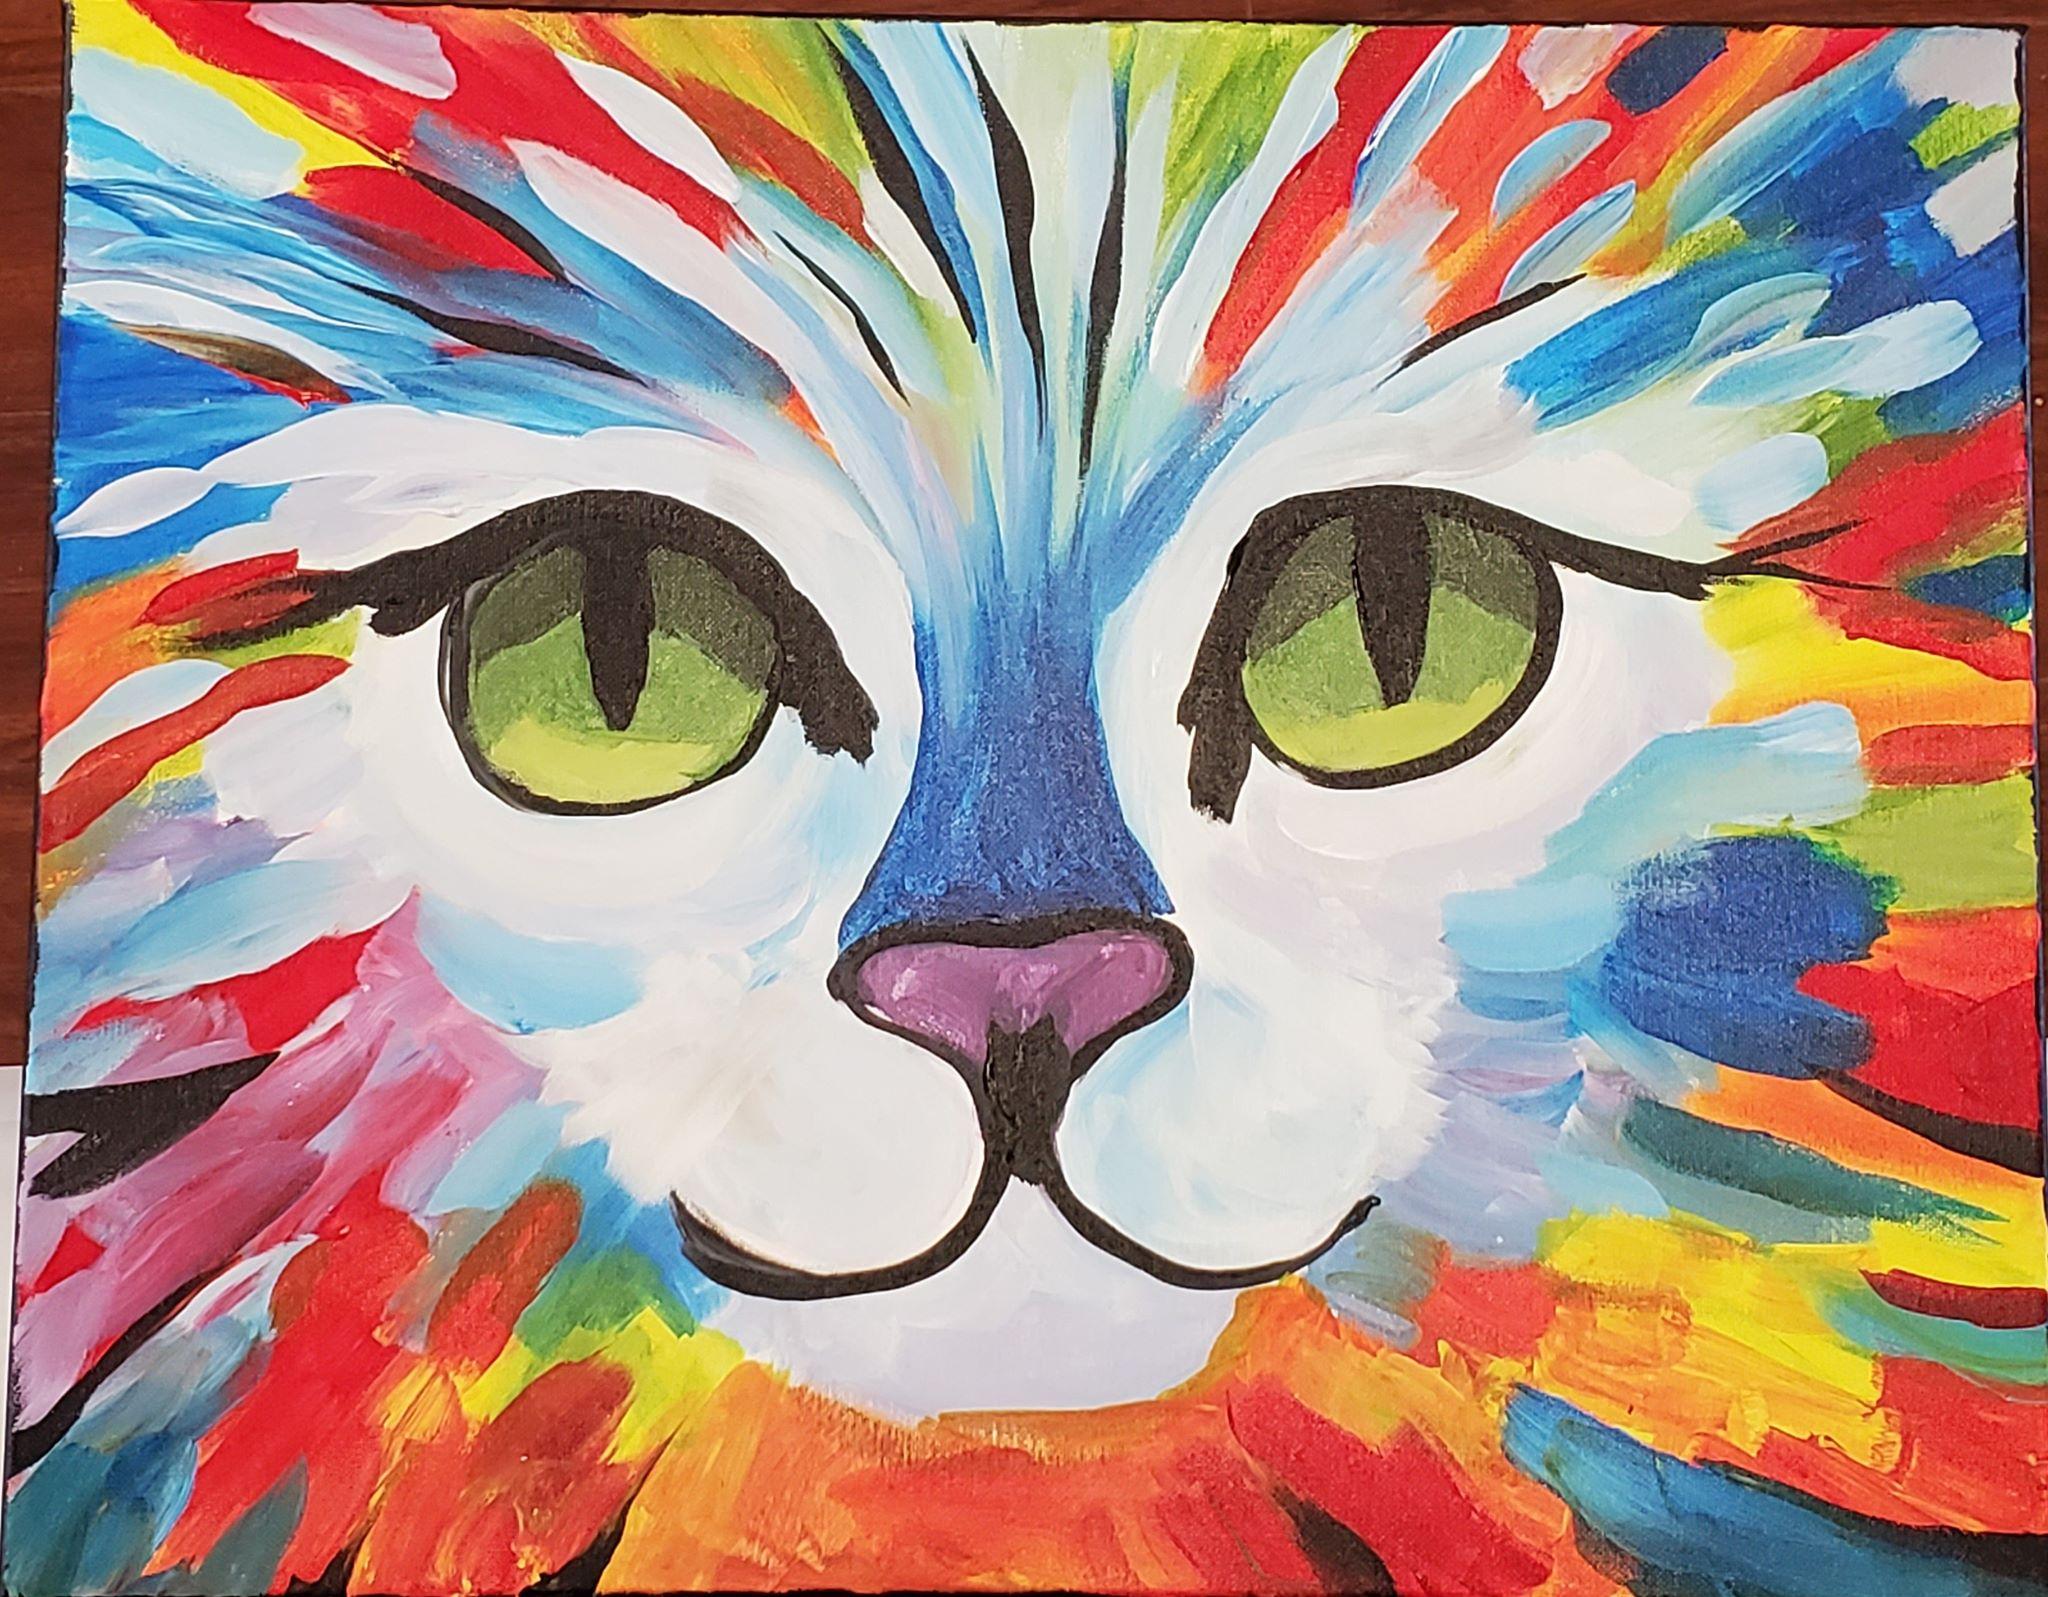 Kitty Face 4/7/2020